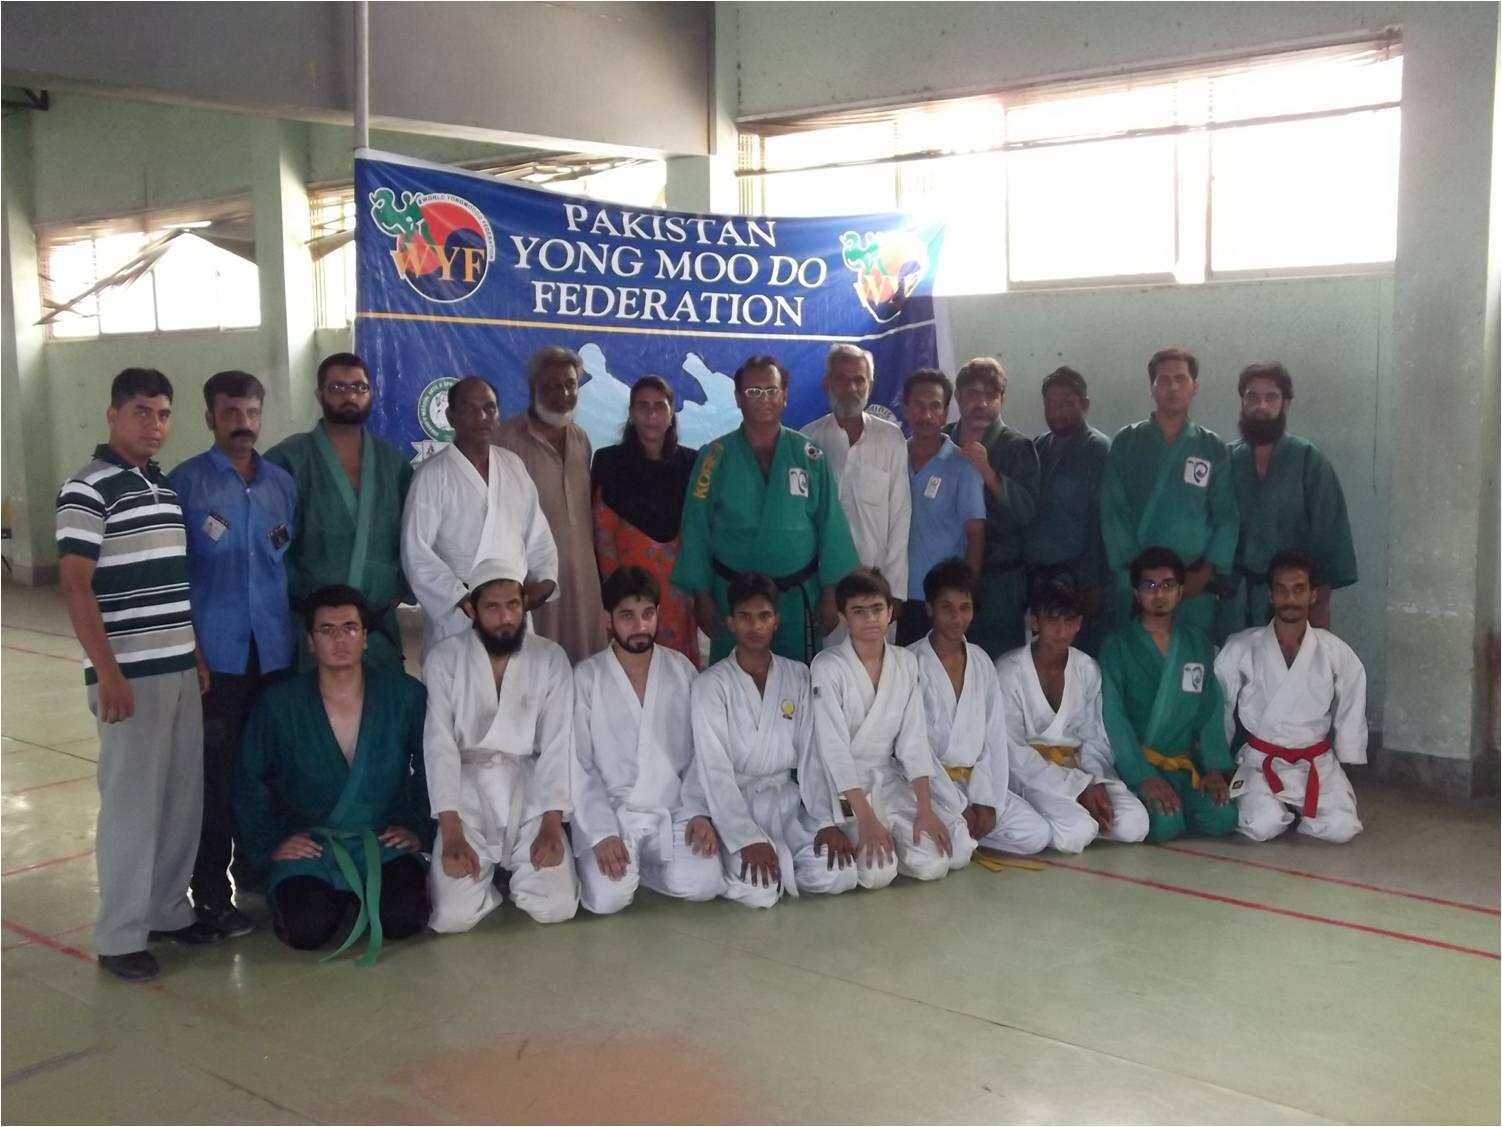 Pakistan Yong Moo Do Federation Seminar